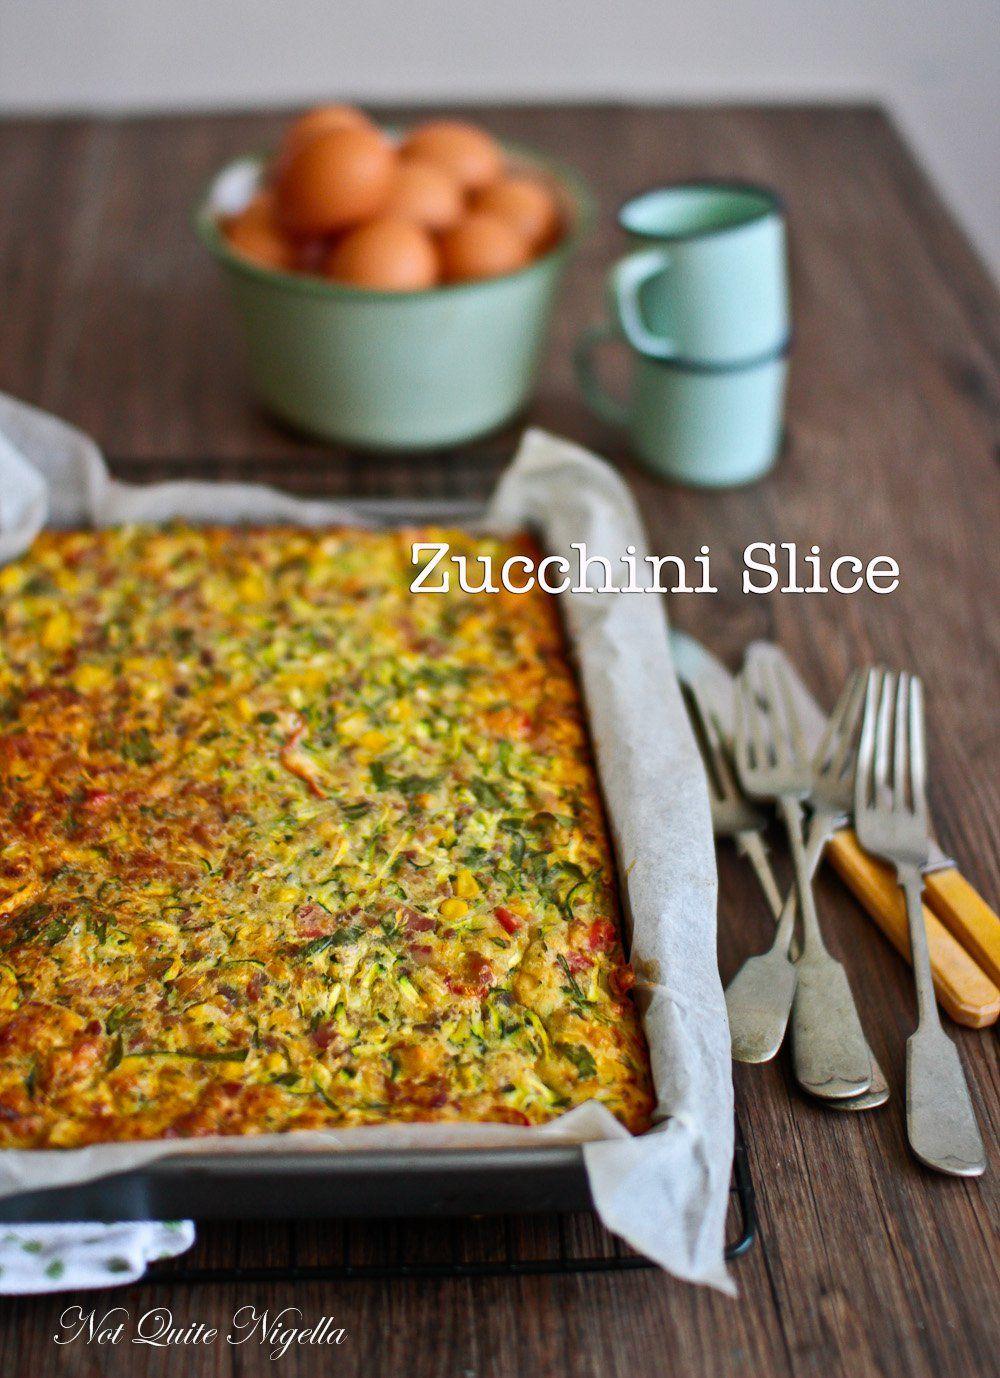 The Incredible Very Edible Zucchini Slice Recipe In 2018 Recipes